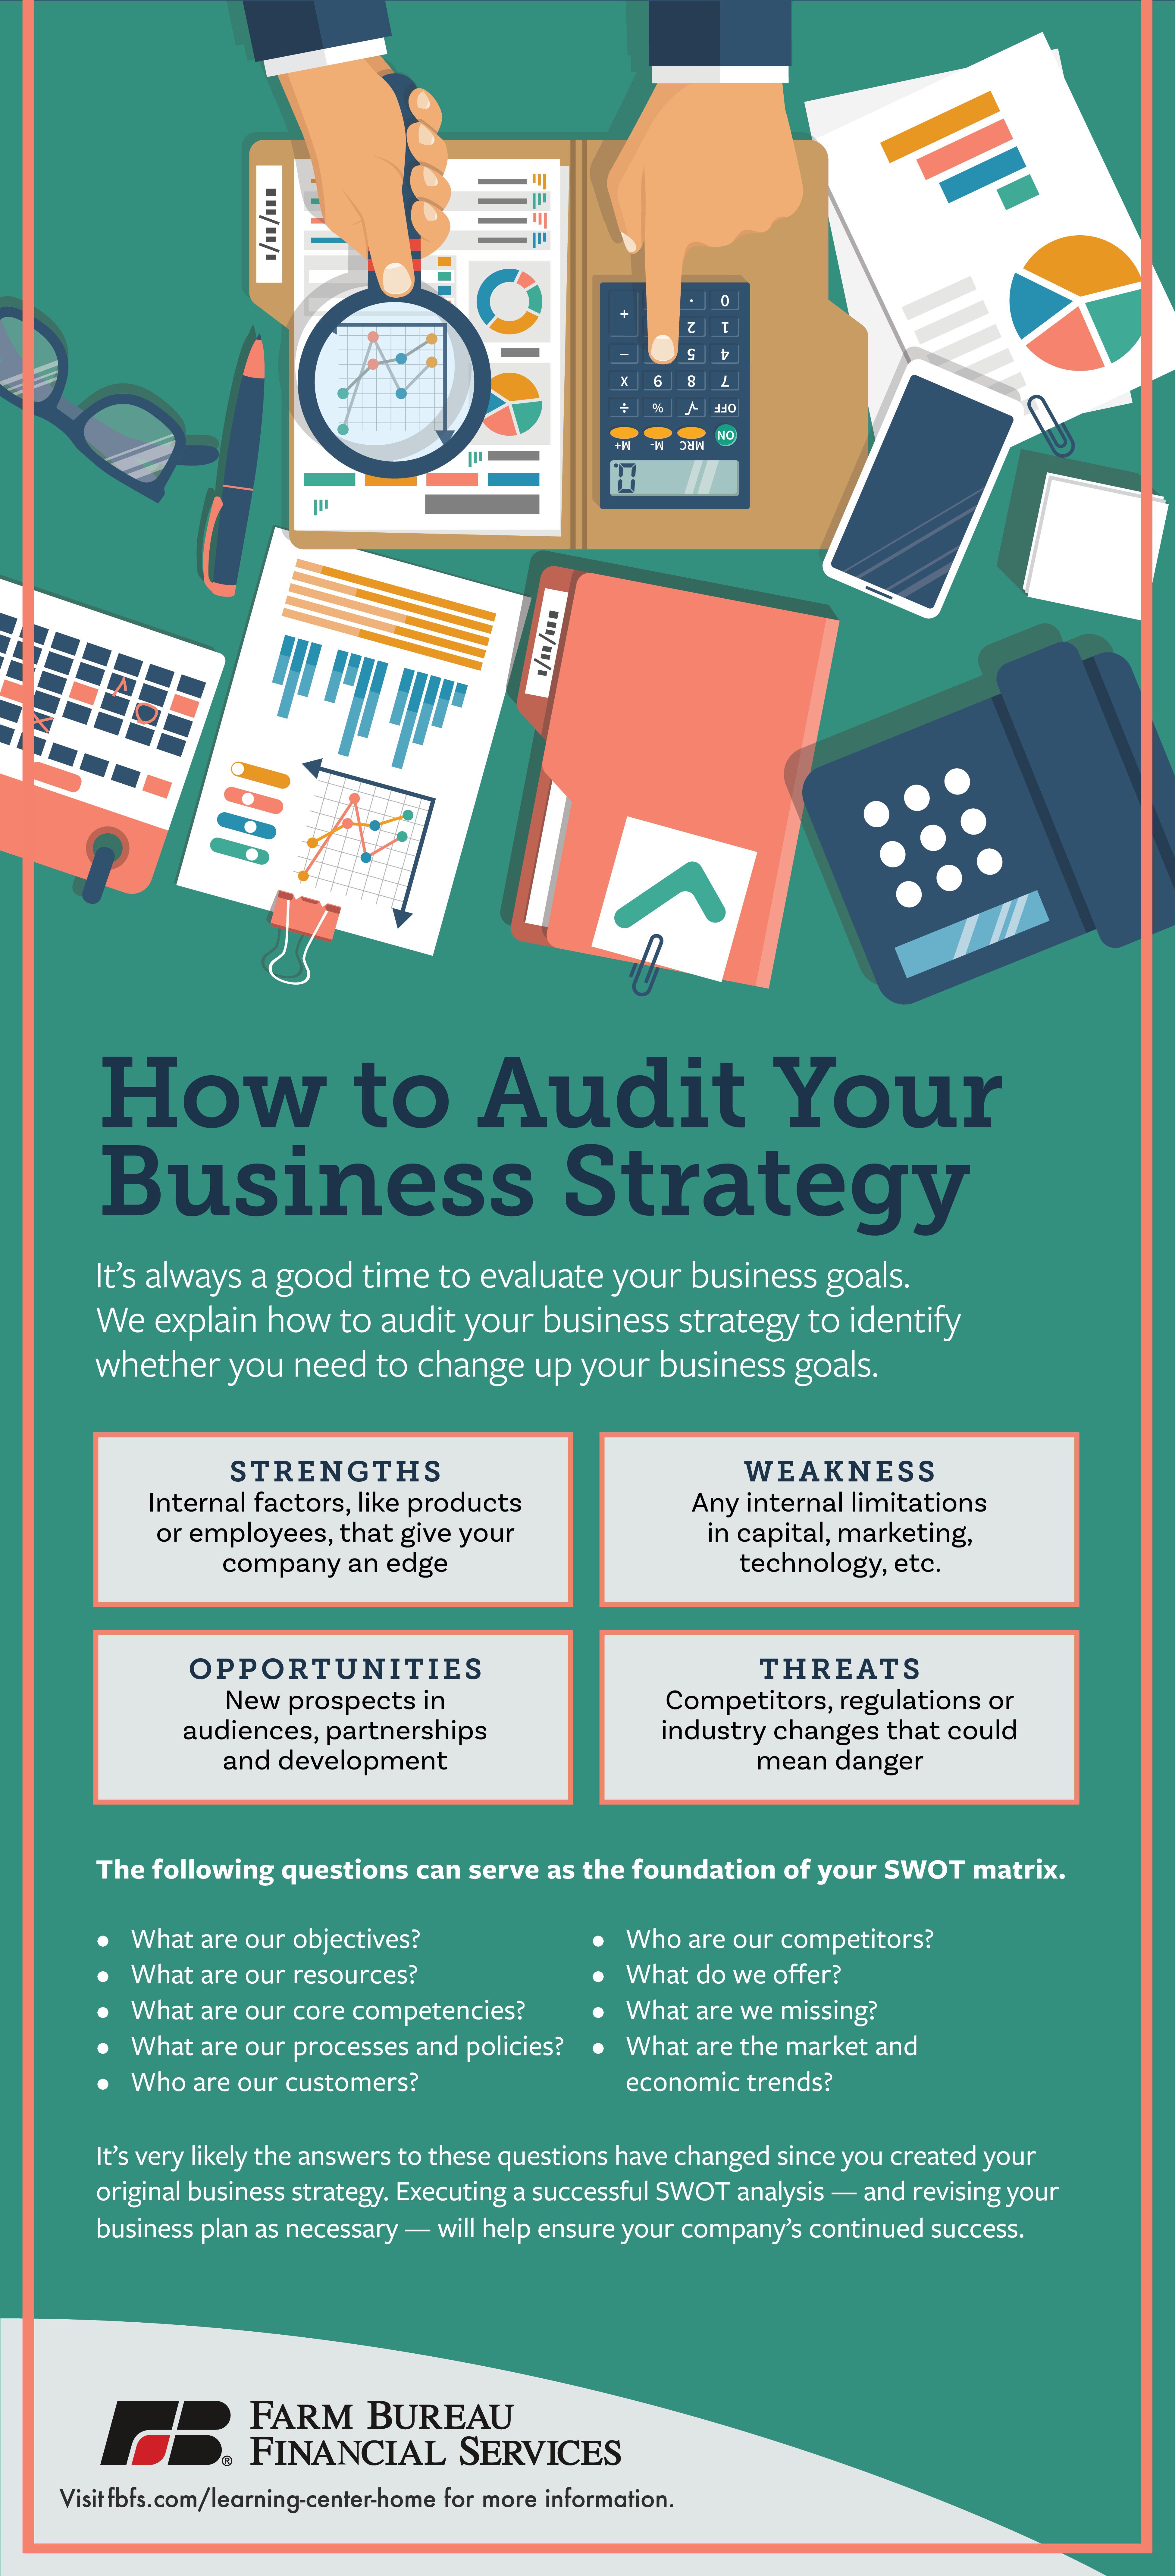 FBFS_AuditBusiness_Infographic_v1